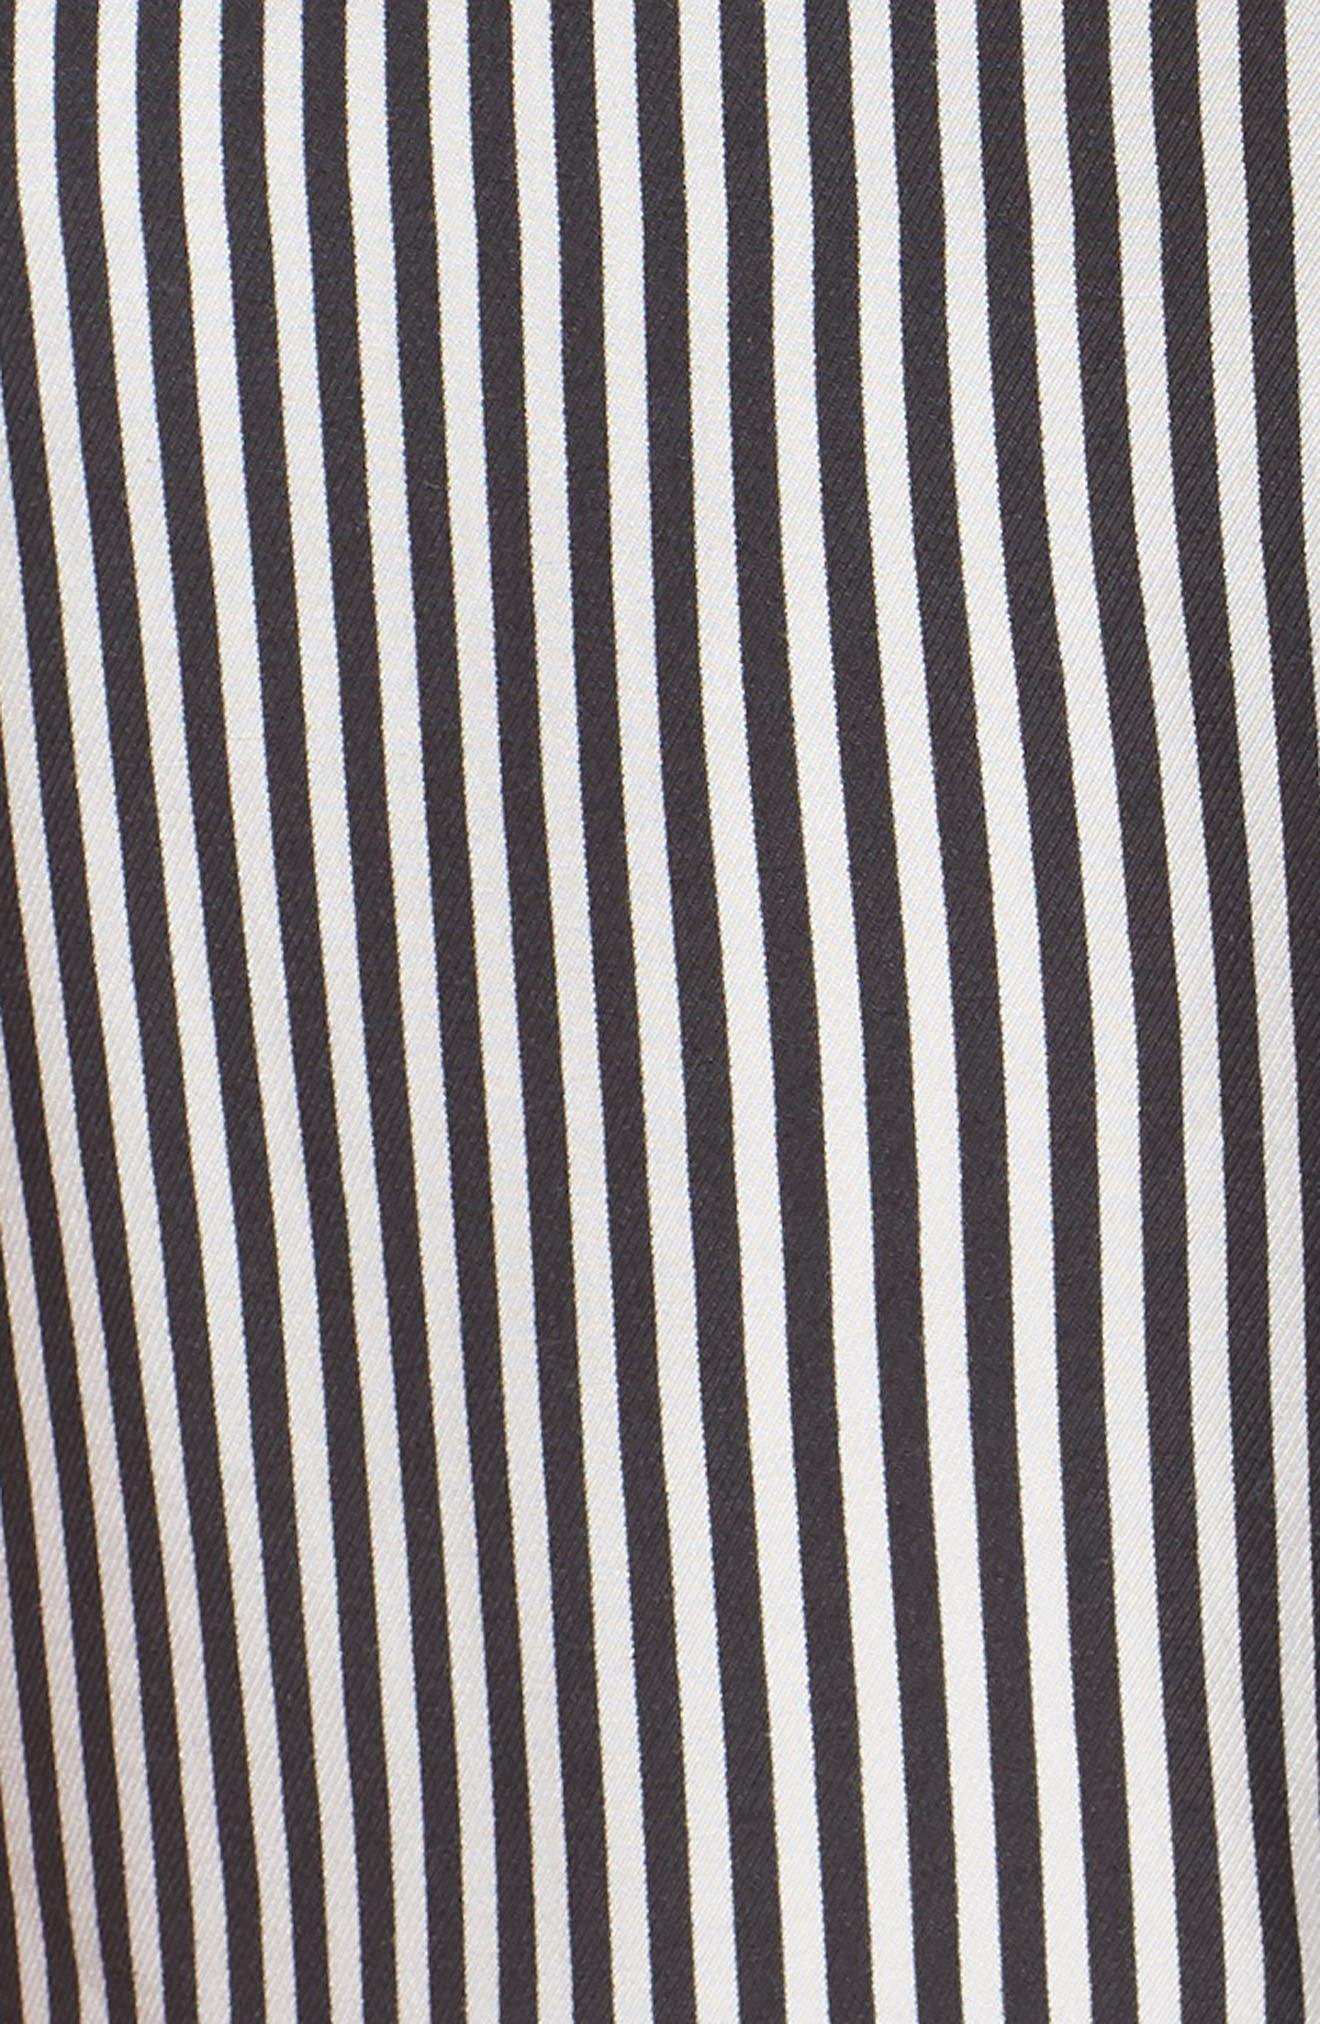 ALI & JAY, All Aboard Minidress, Alternate thumbnail 6, color, BLACK/ WHITE